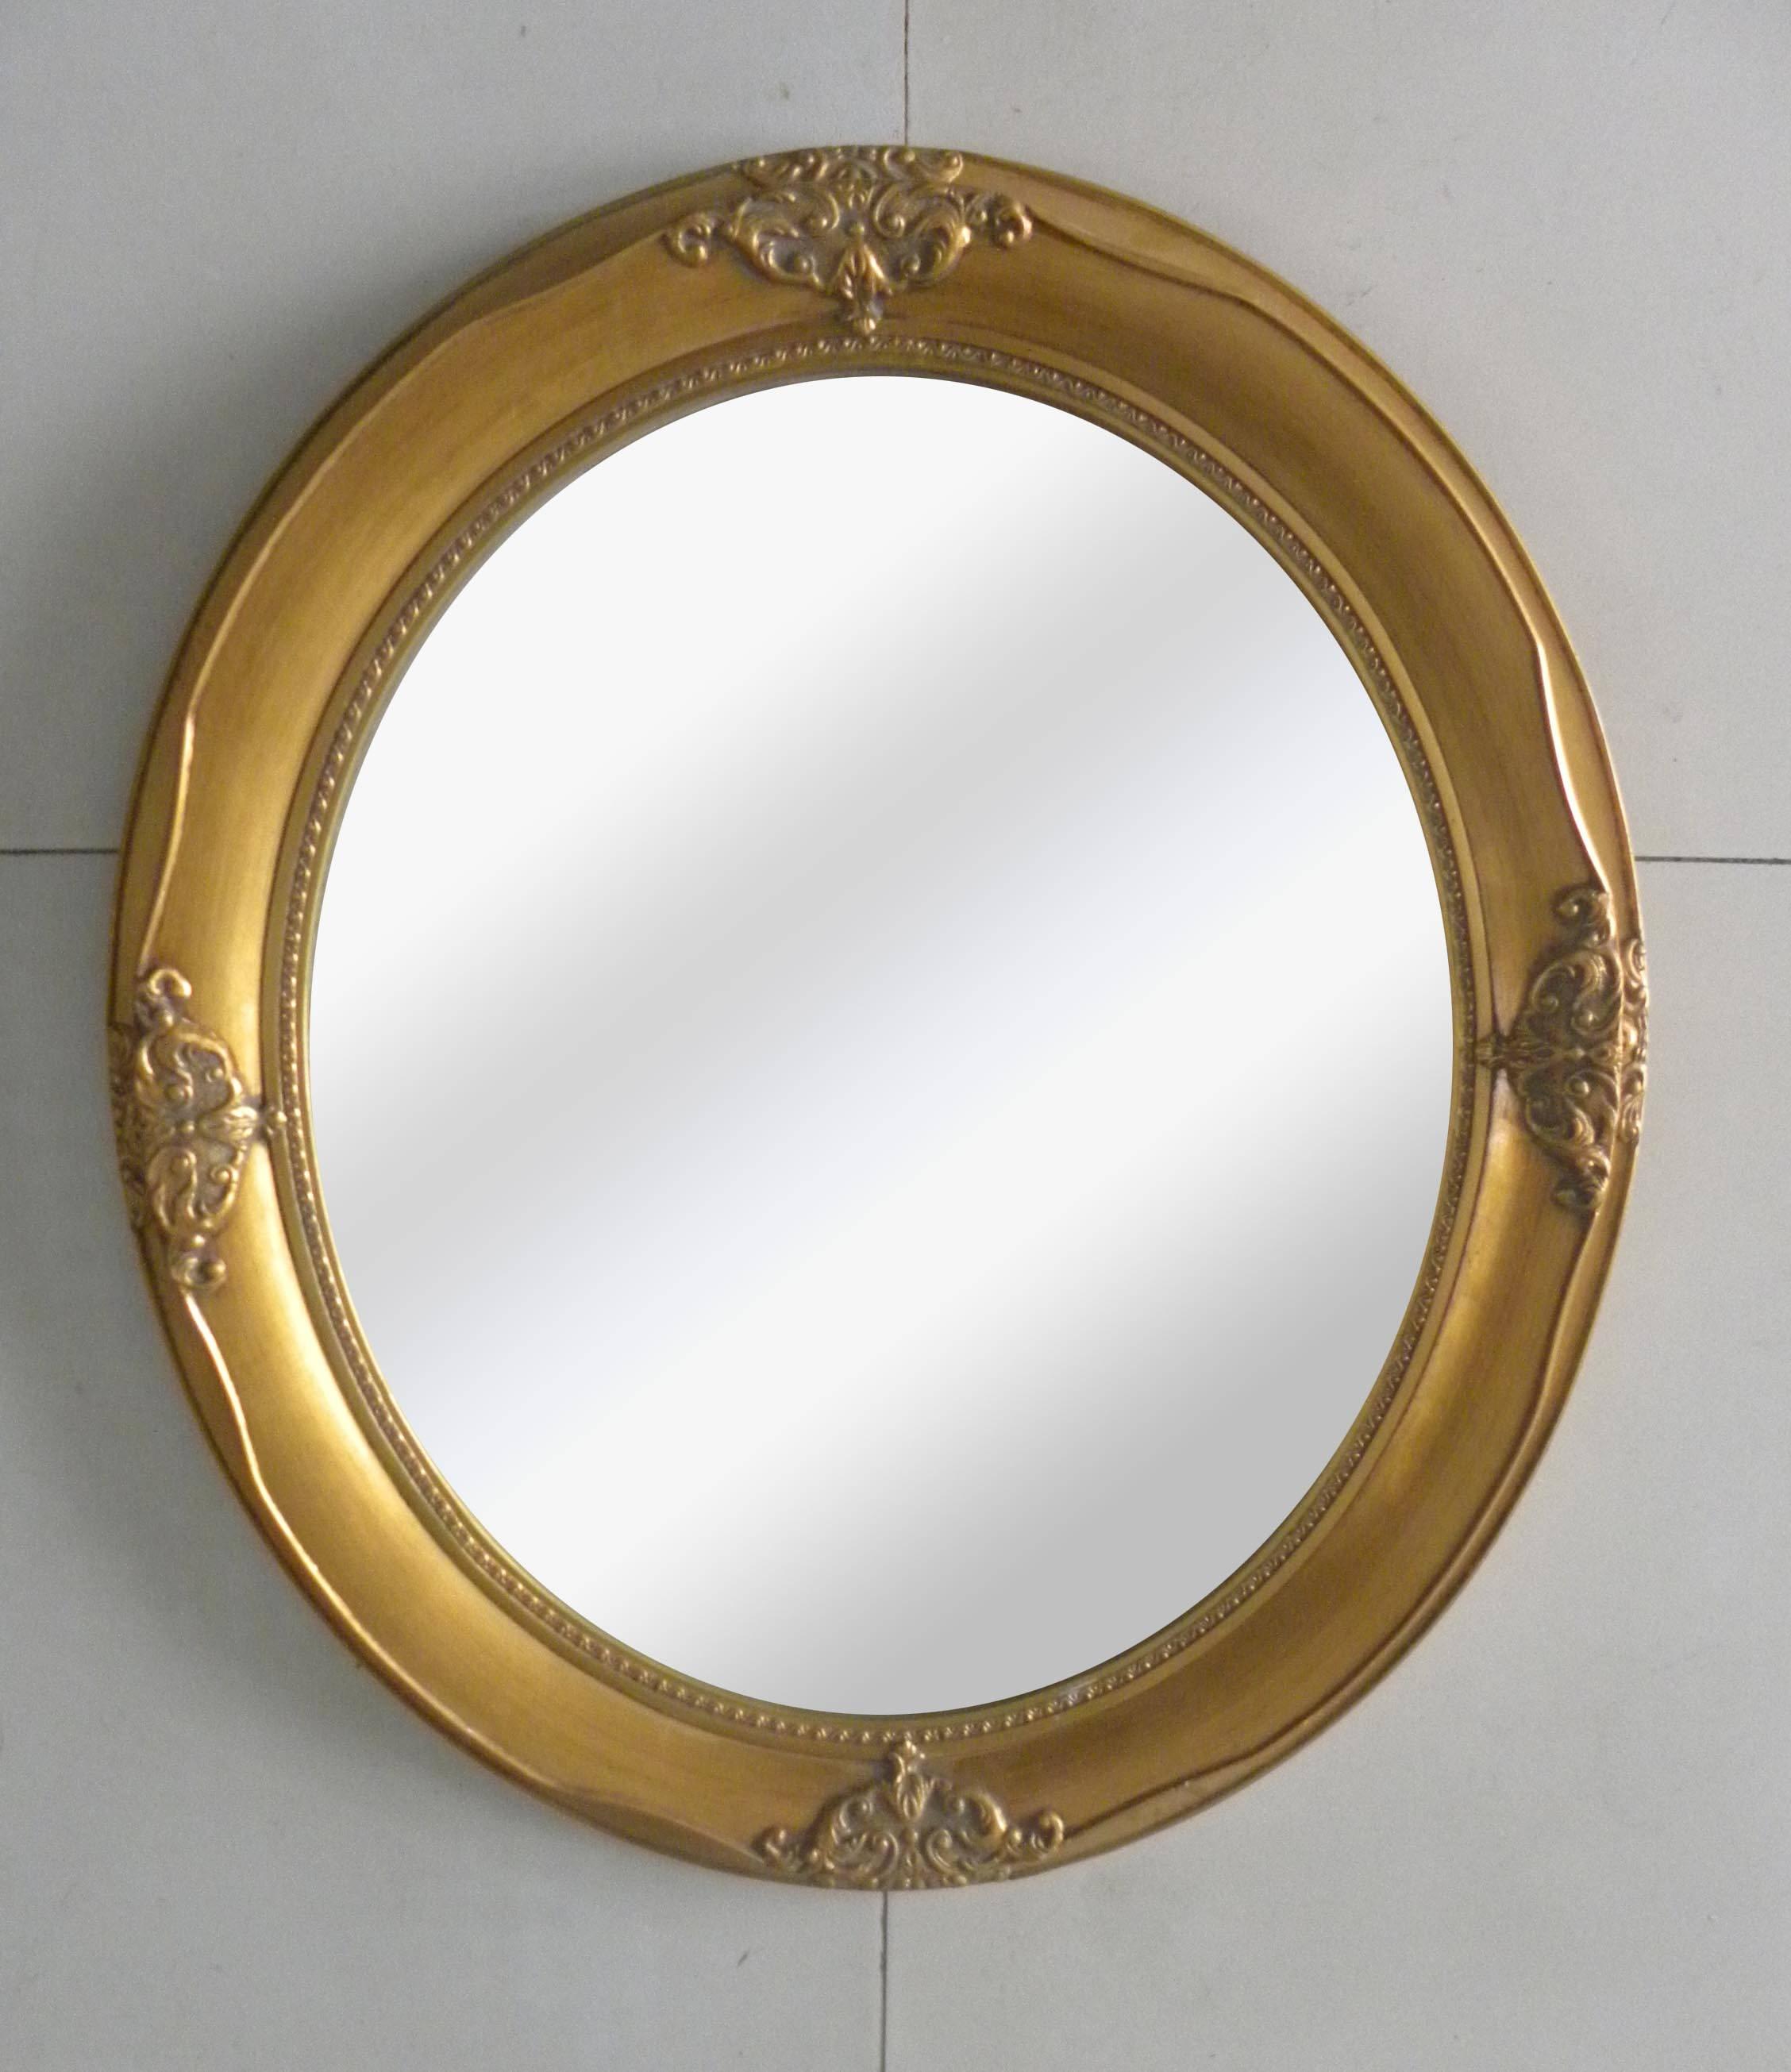 decorative mirror frames, wall mirrors